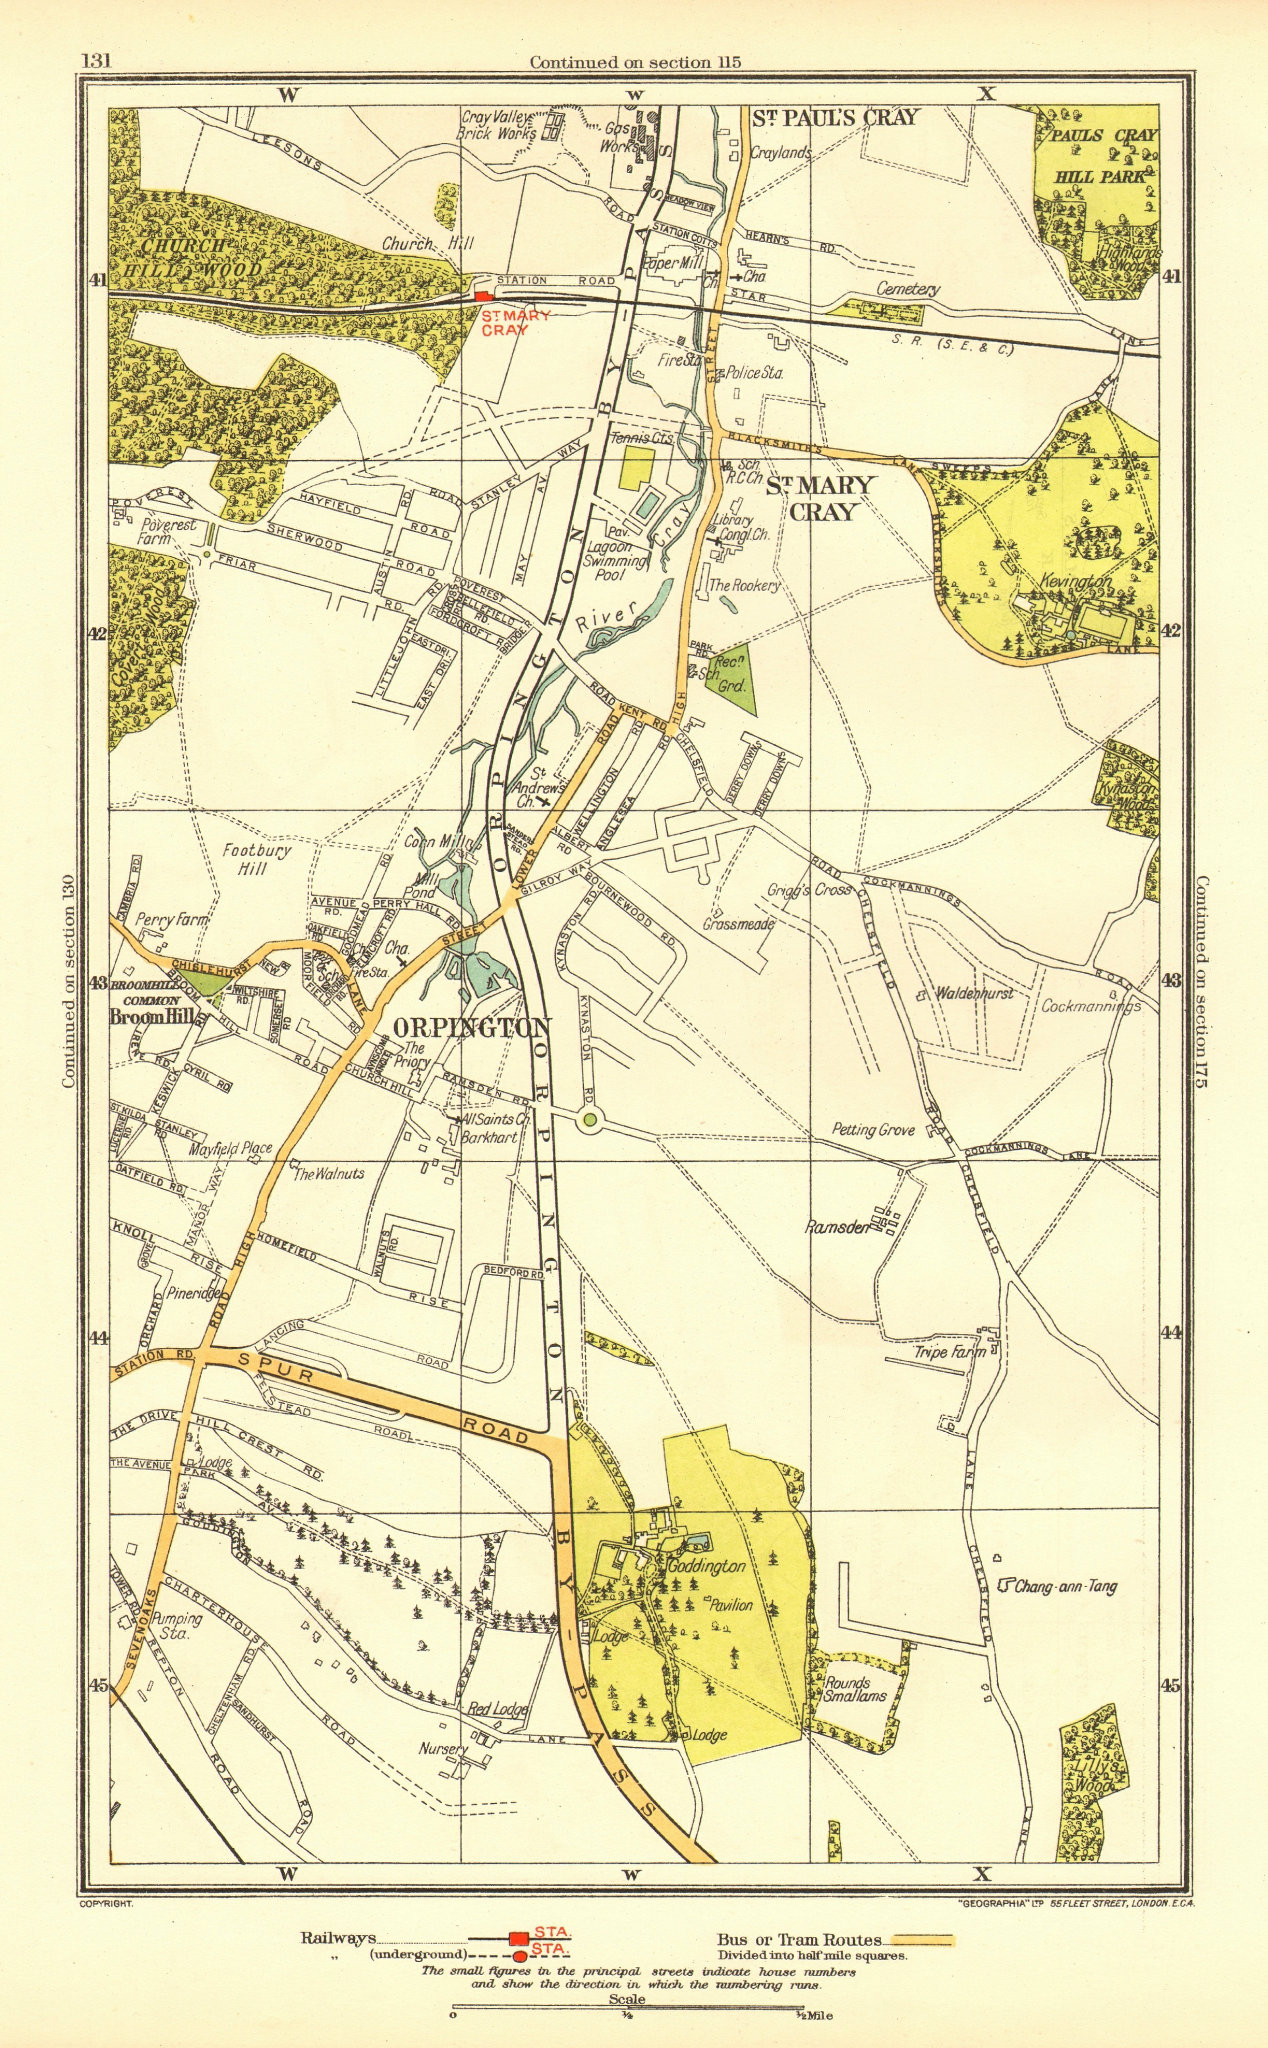 ORPINGTON. St Mary Cray St Paul's Cray Broom Hill Goddington 1937 old map